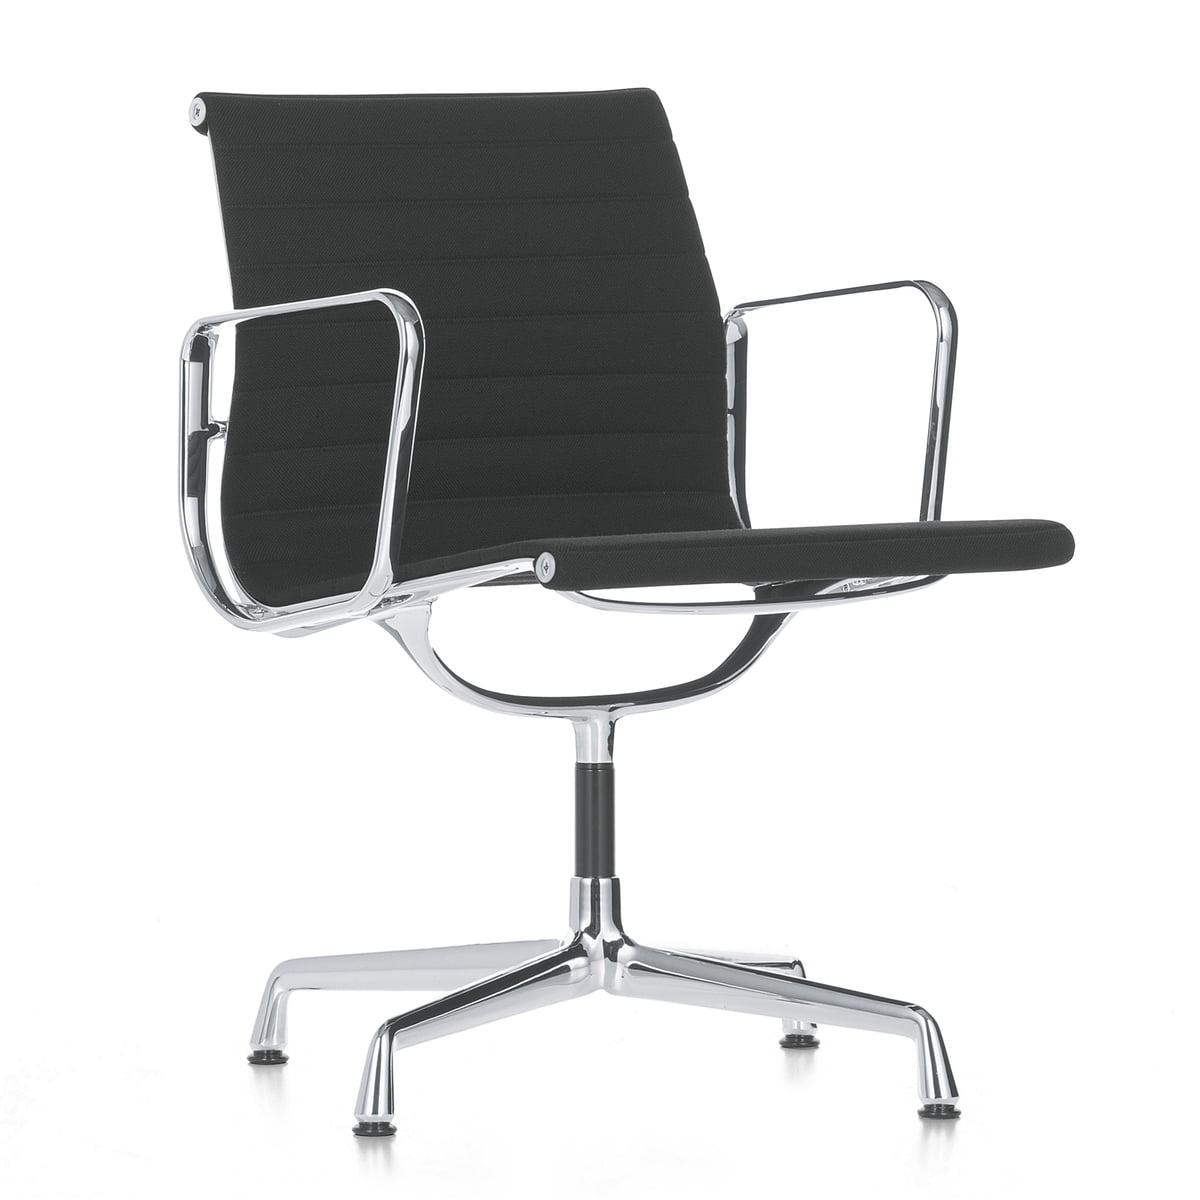 vitra ea 107 stuhl poliert mit armlehnen hopsak nero. Black Bedroom Furniture Sets. Home Design Ideas